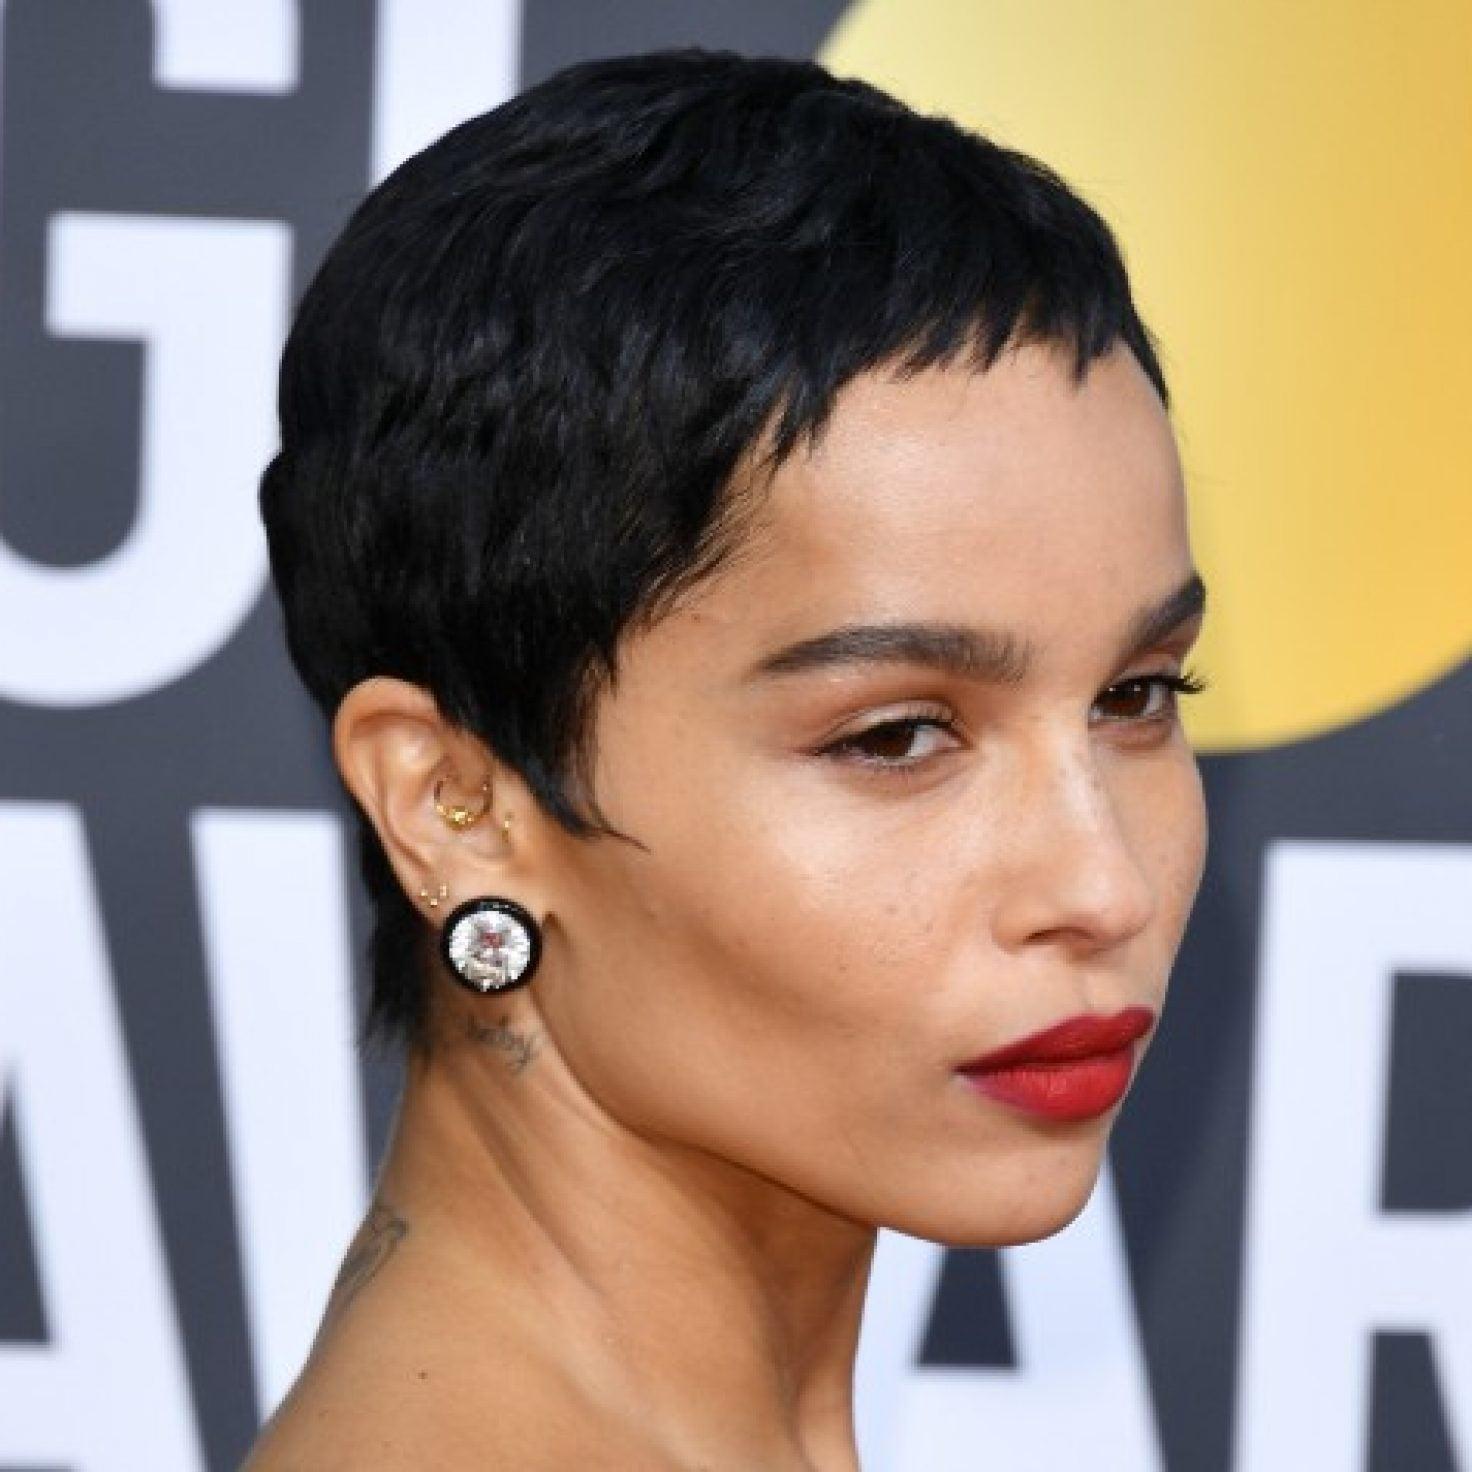 Short Hair Stole The Spotlight At The Golden Globes